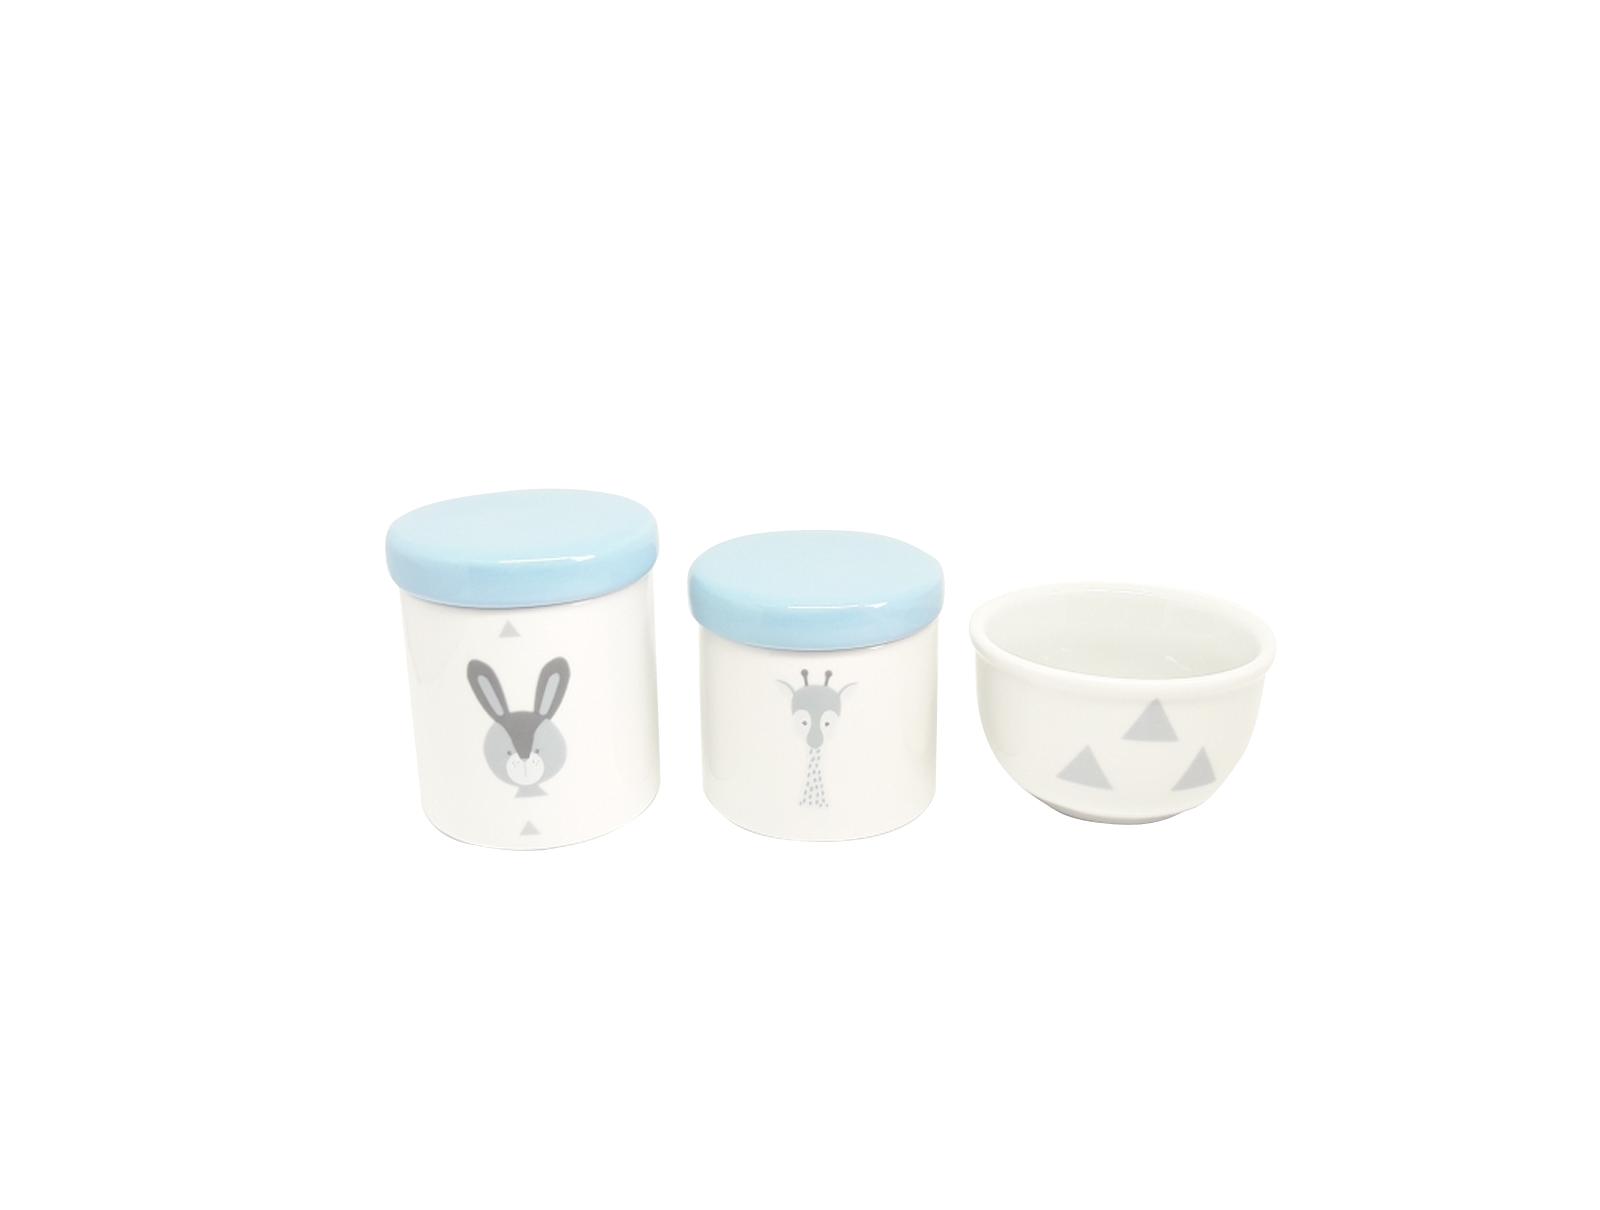 Kit Higiene Bebê Porcelana Escandinavo |Coelho e Girafa | Geométrico| Tampa Azul